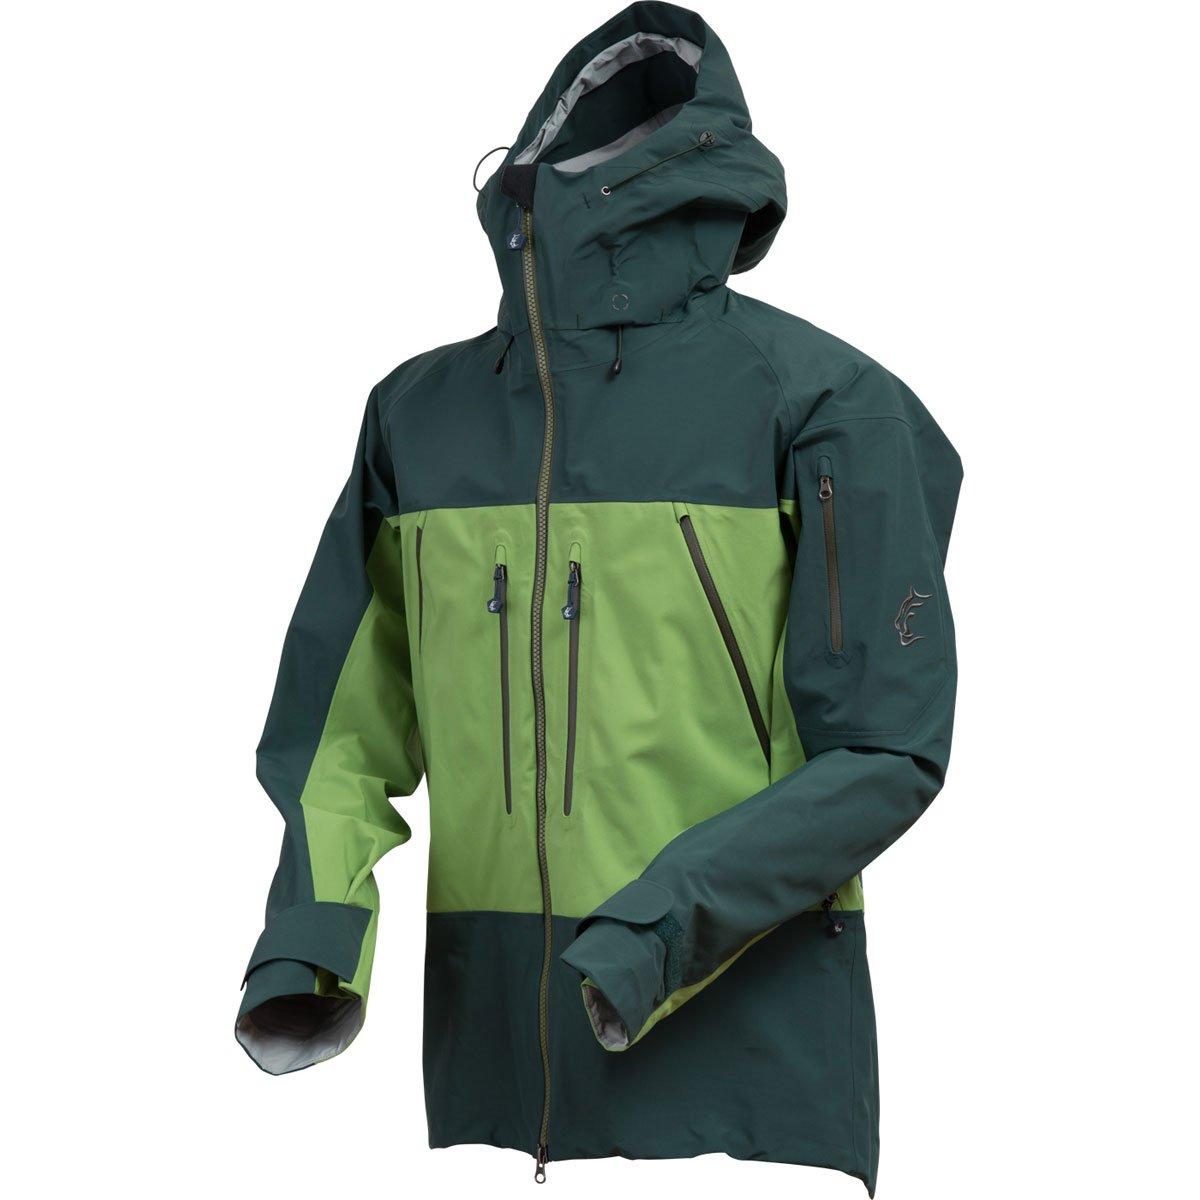 Teton Bros.(ティートンブロス) TBジャケット男性用 17301M B076HGRH1L L|ディープグリーン/グリーン ディープグリーン/グリーン L